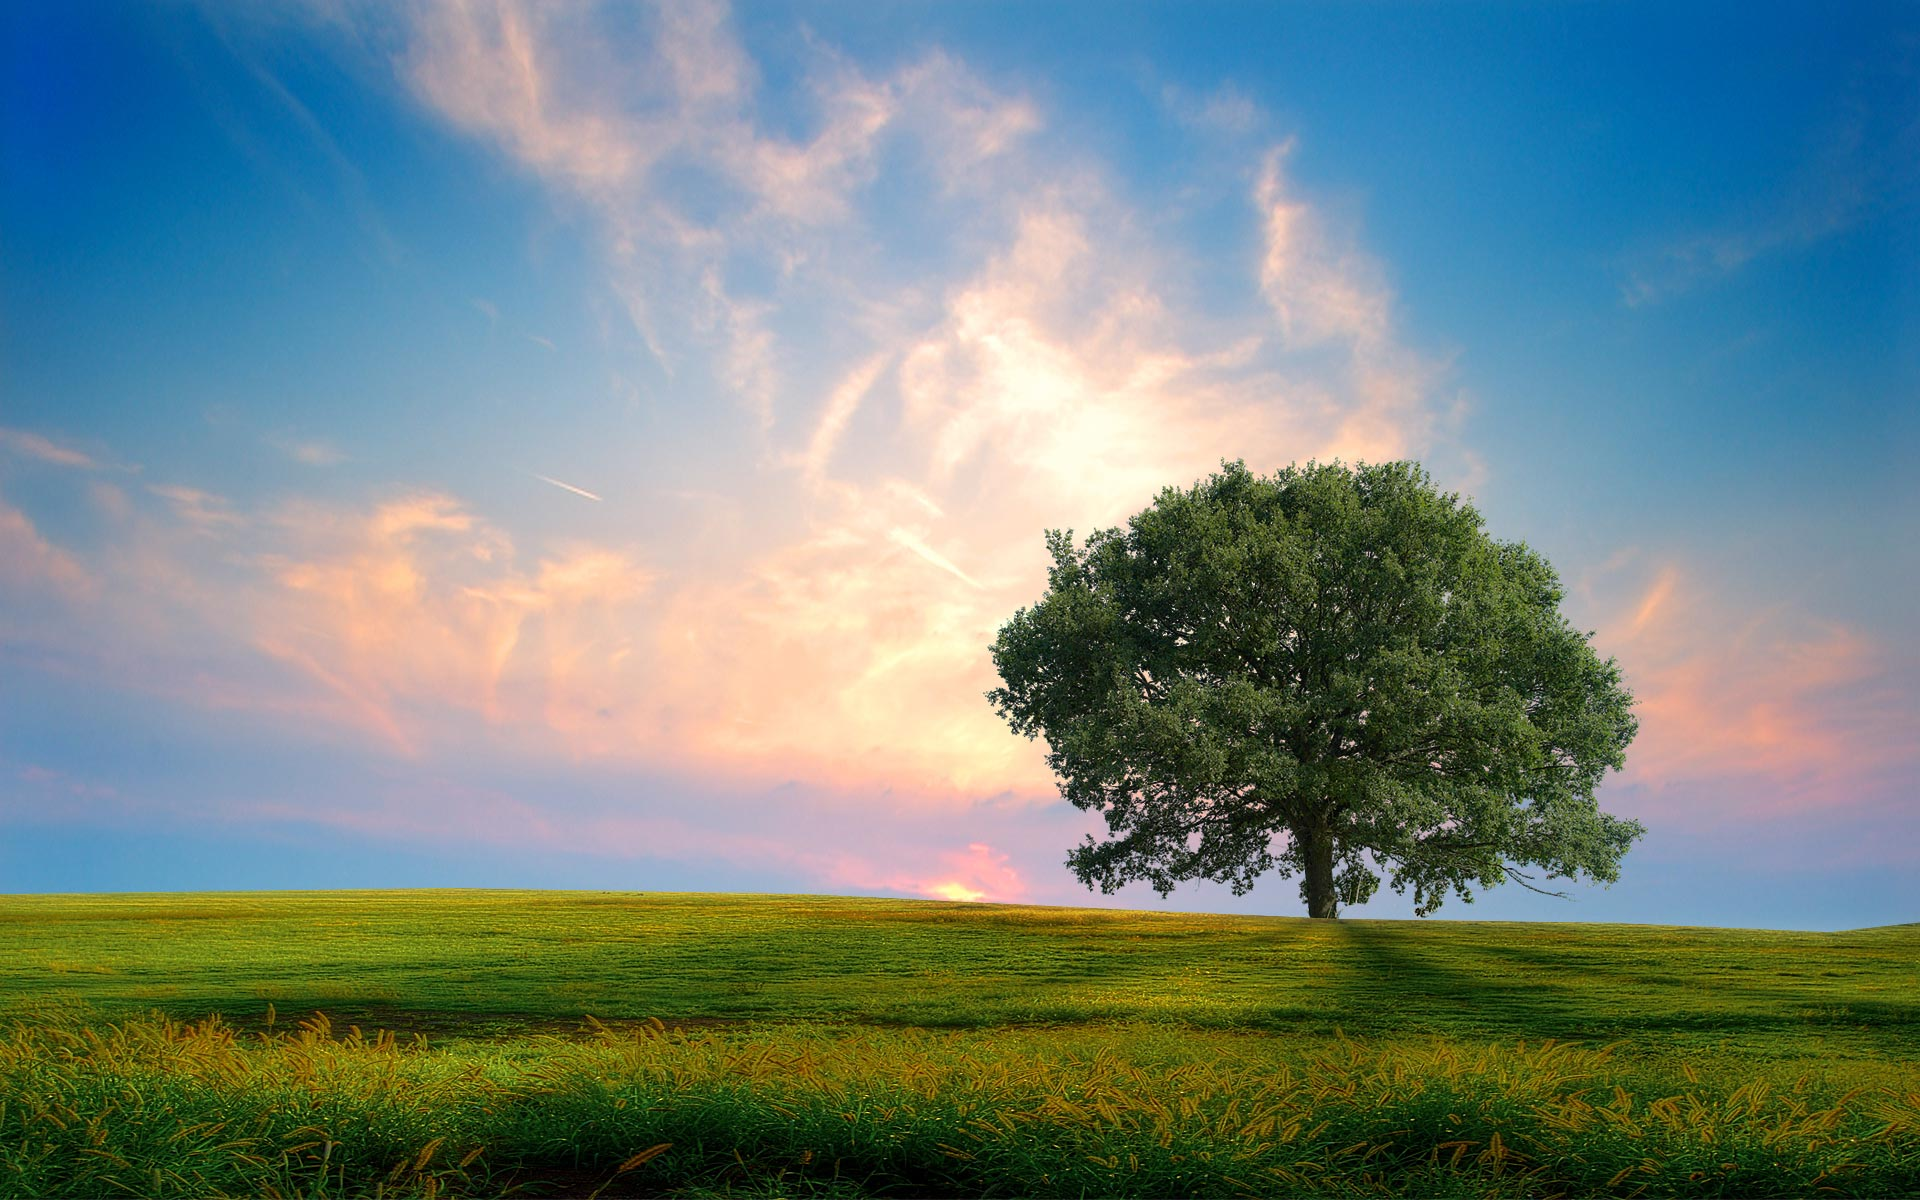 summer landscape image wallpaper - photo #17